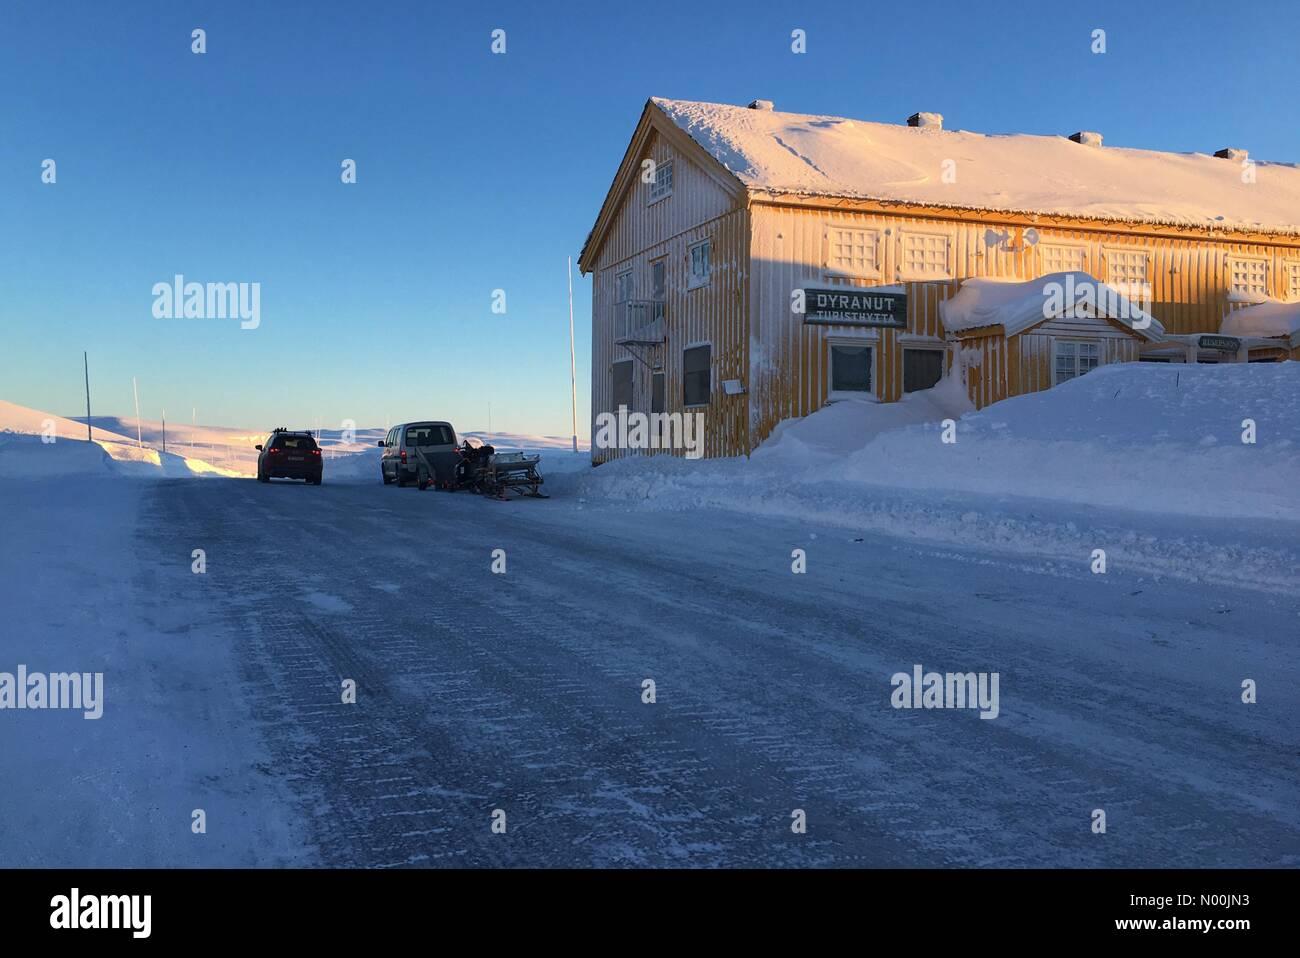 Rv7 100, Vøringsfoss, Norway. 06th Jan, 2018. Sun going down on Dyranut mountain lodge, on road 7 crossing Hardangervidda Stock Photo